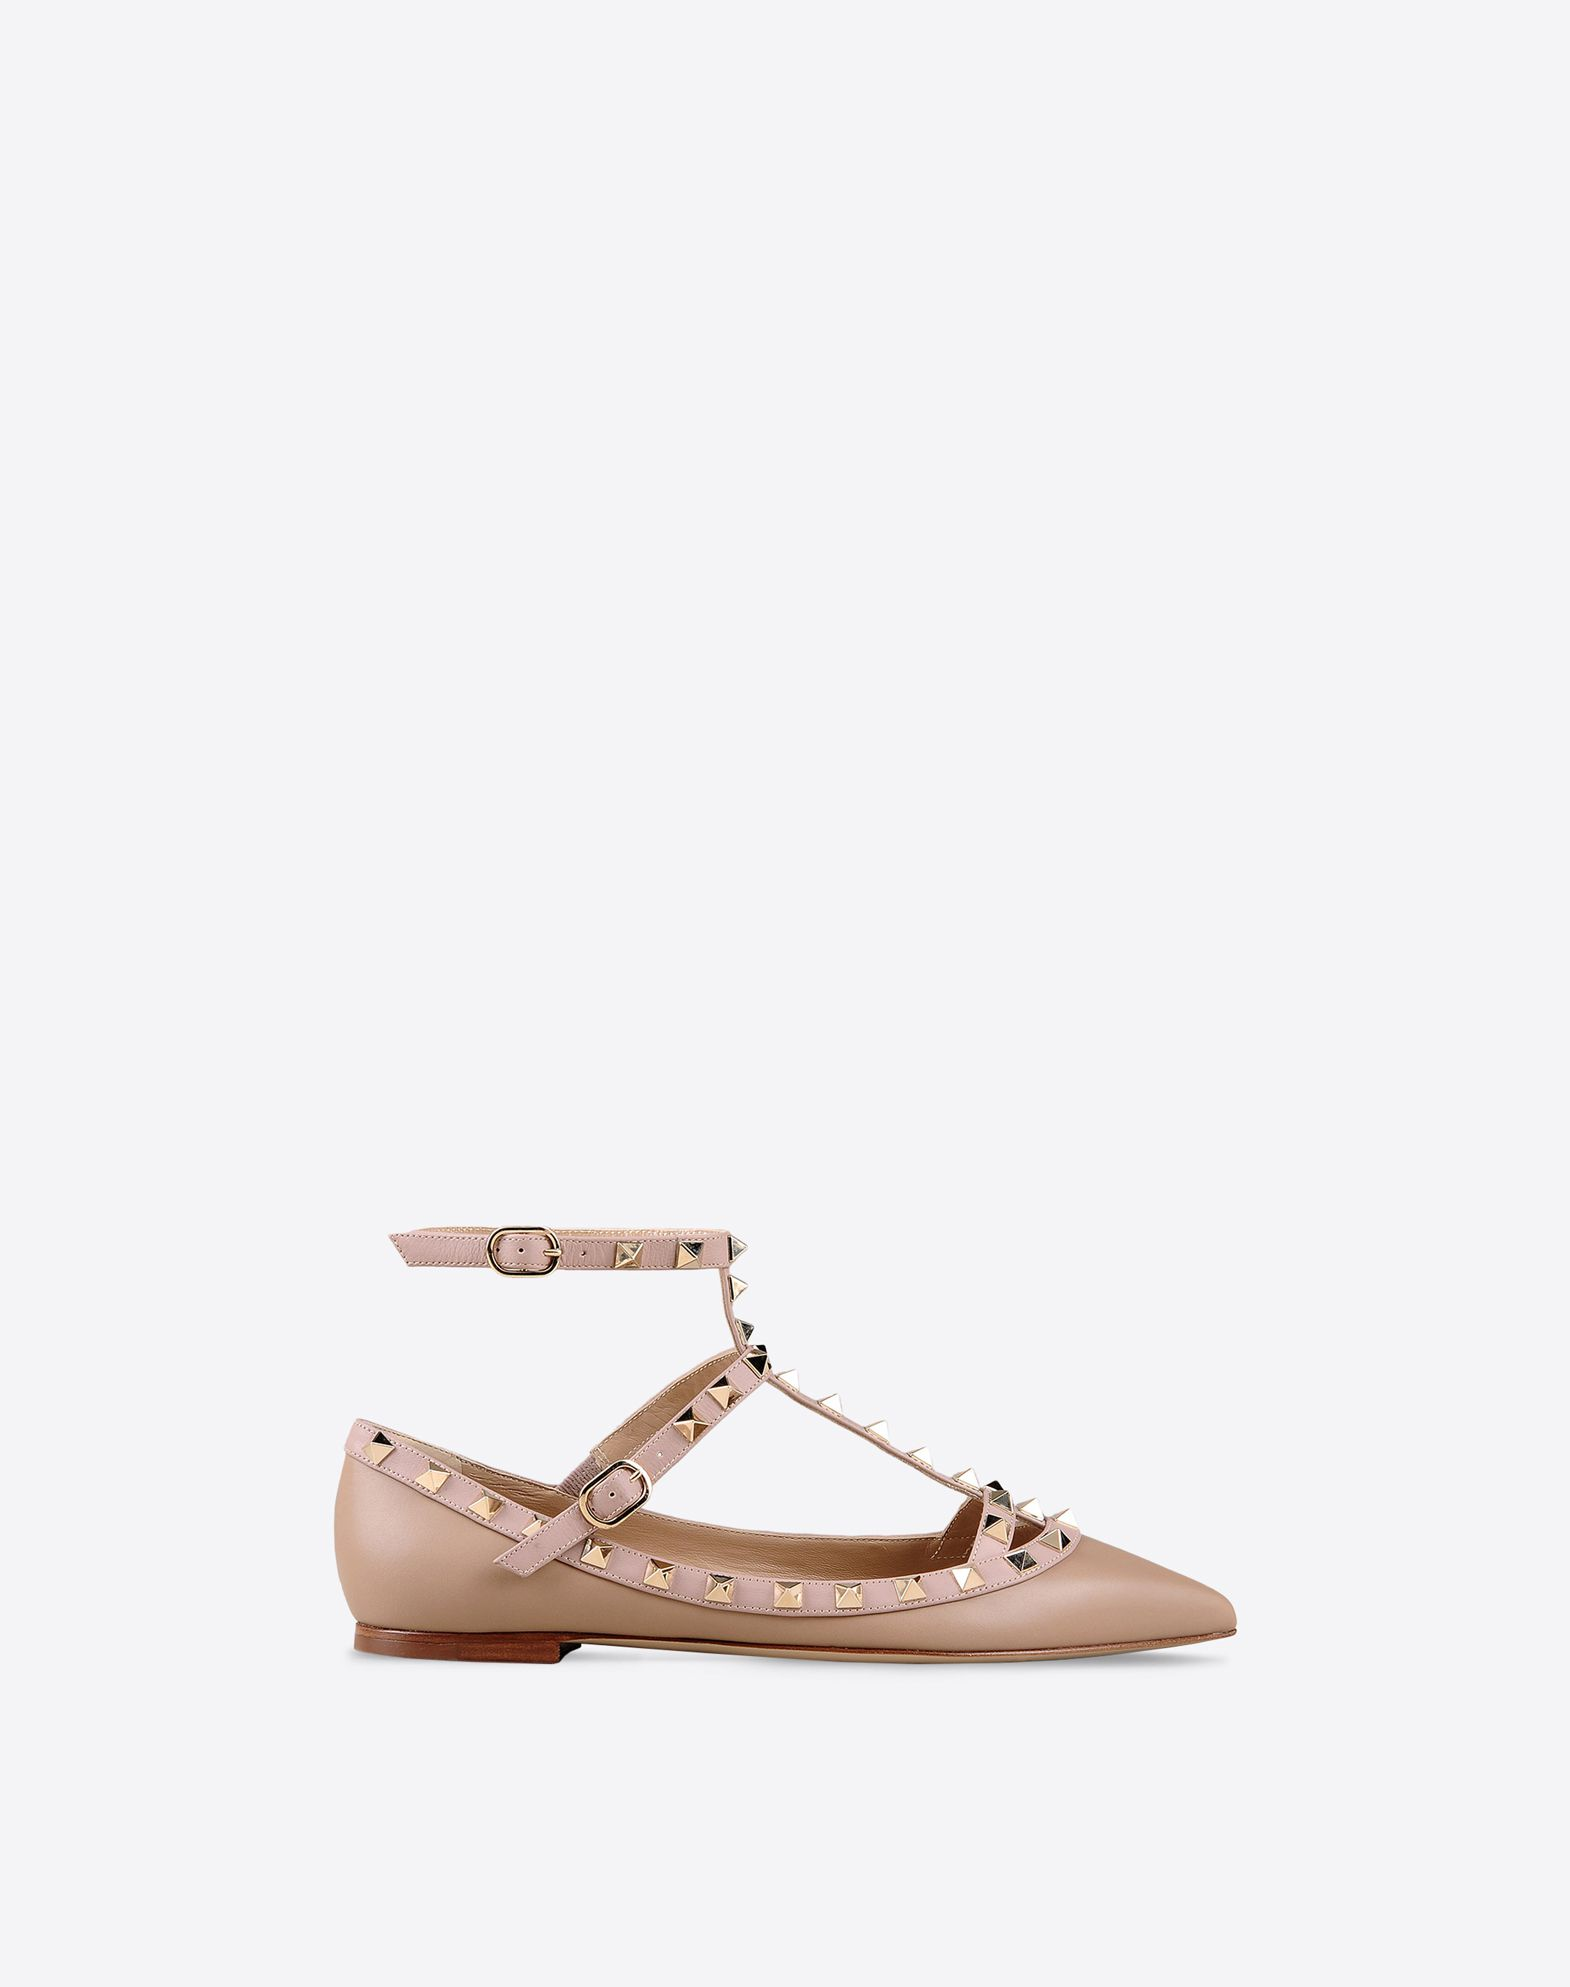 VALENTINO Metal Applications Two-tone pattern Side buckle closure Leather sole Narrow toeline Flat heel  44796038cj